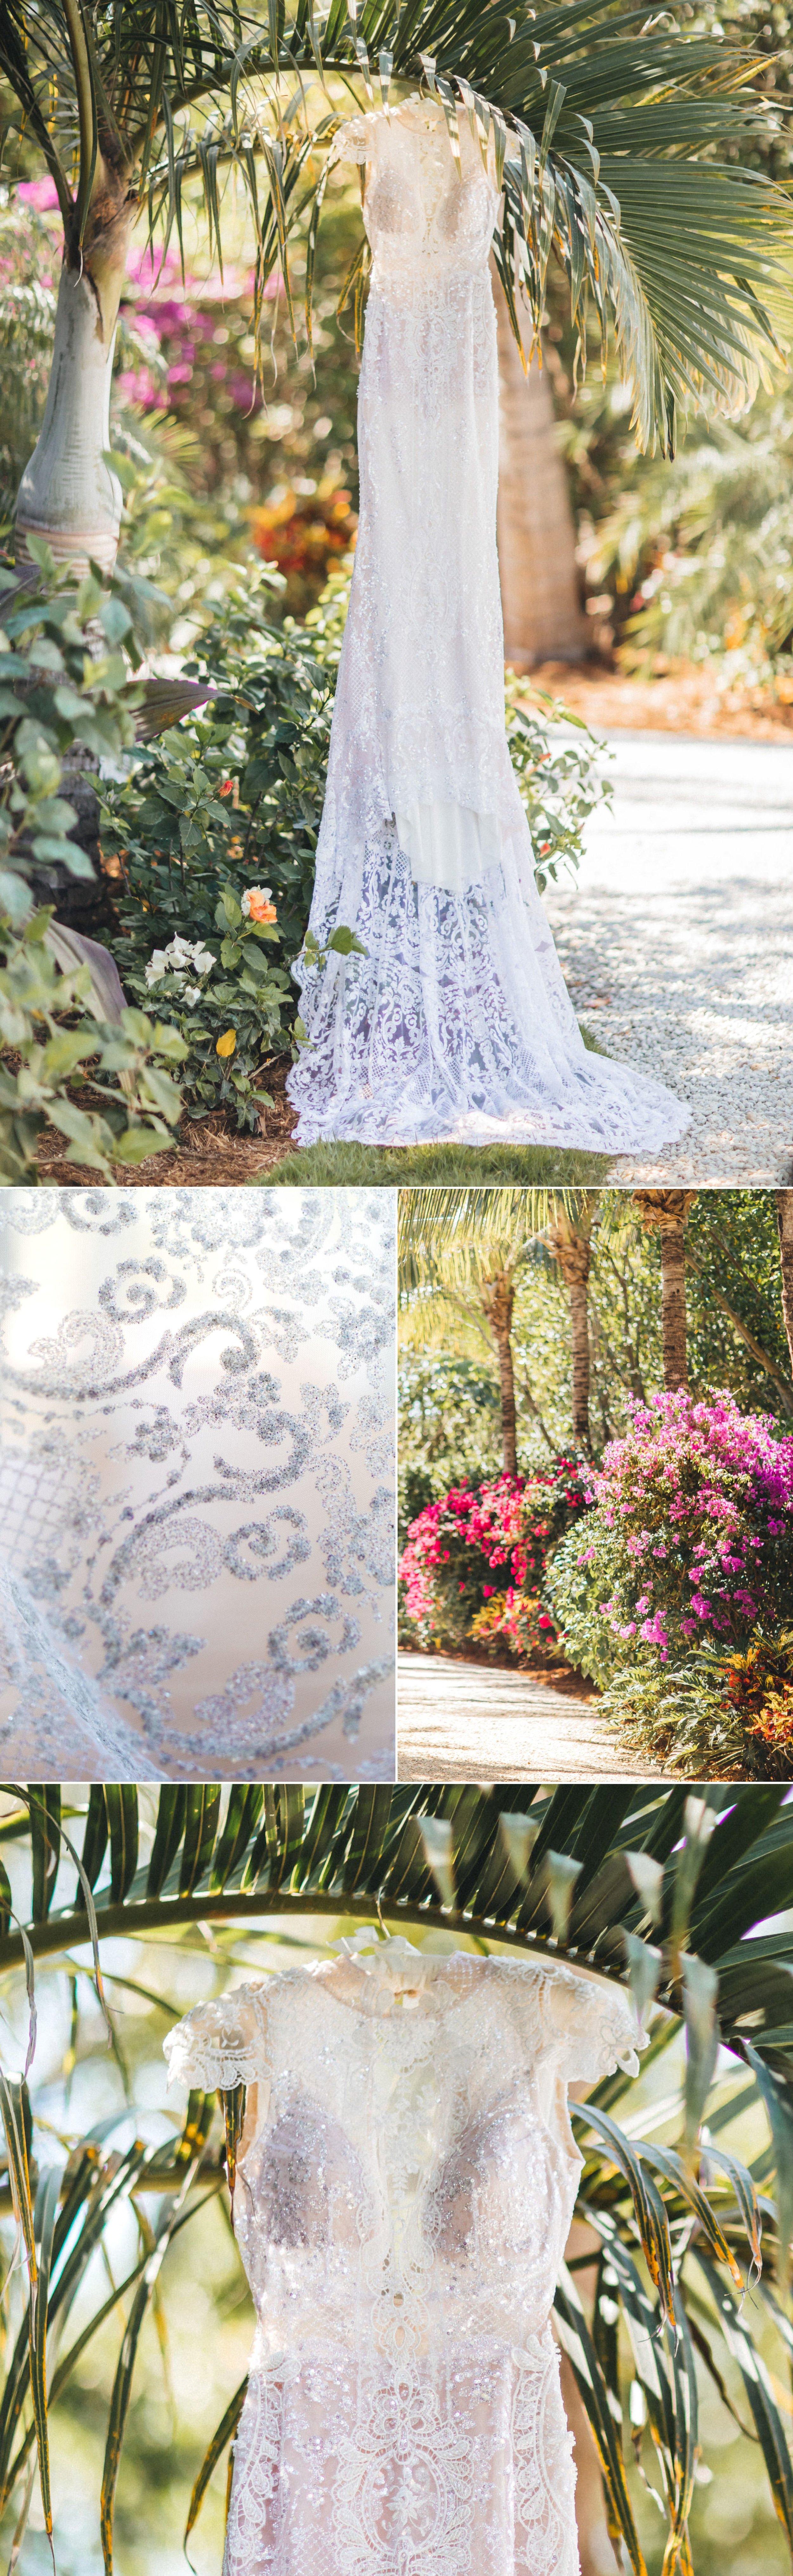 Captiva Island Destination Elopement Wedding Photography-blog- Zohra+David-by-Shaina-DeCiryan6.jpg